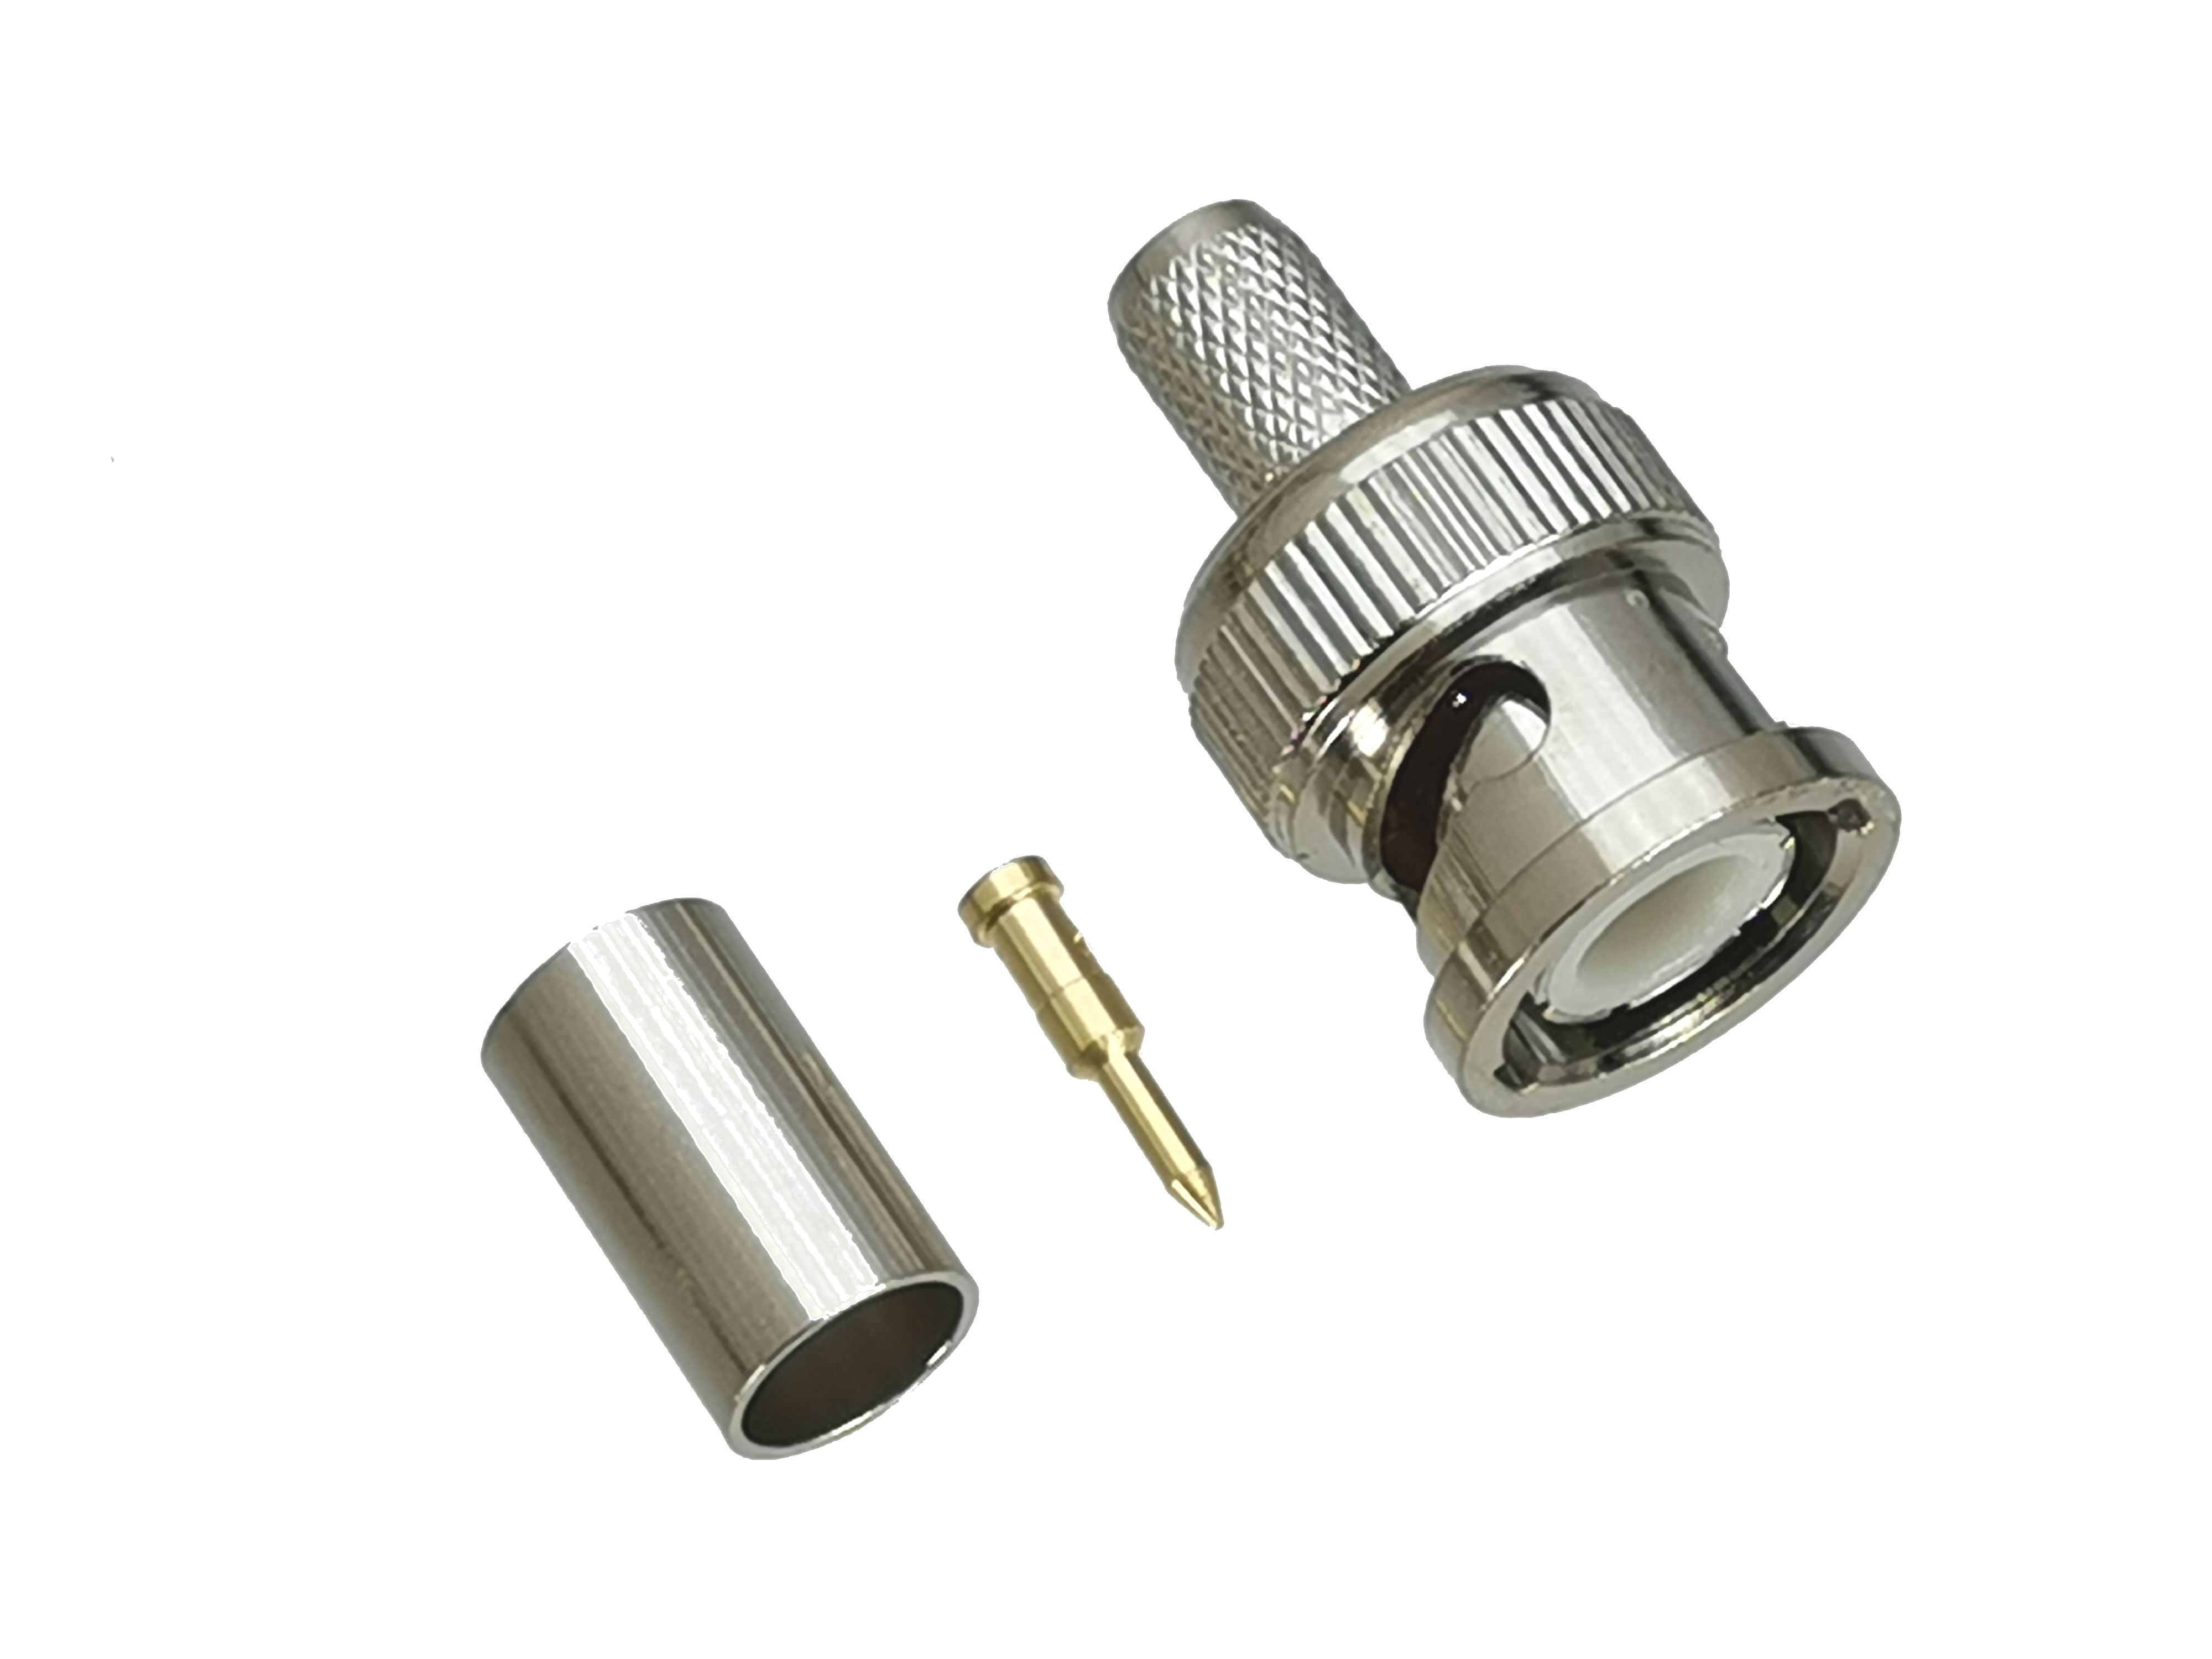 10 pces conector bnc macho plug friso para rg8x RG-8X lmr240 cabo 50ohm rf adaptador coaxial alta quanlity